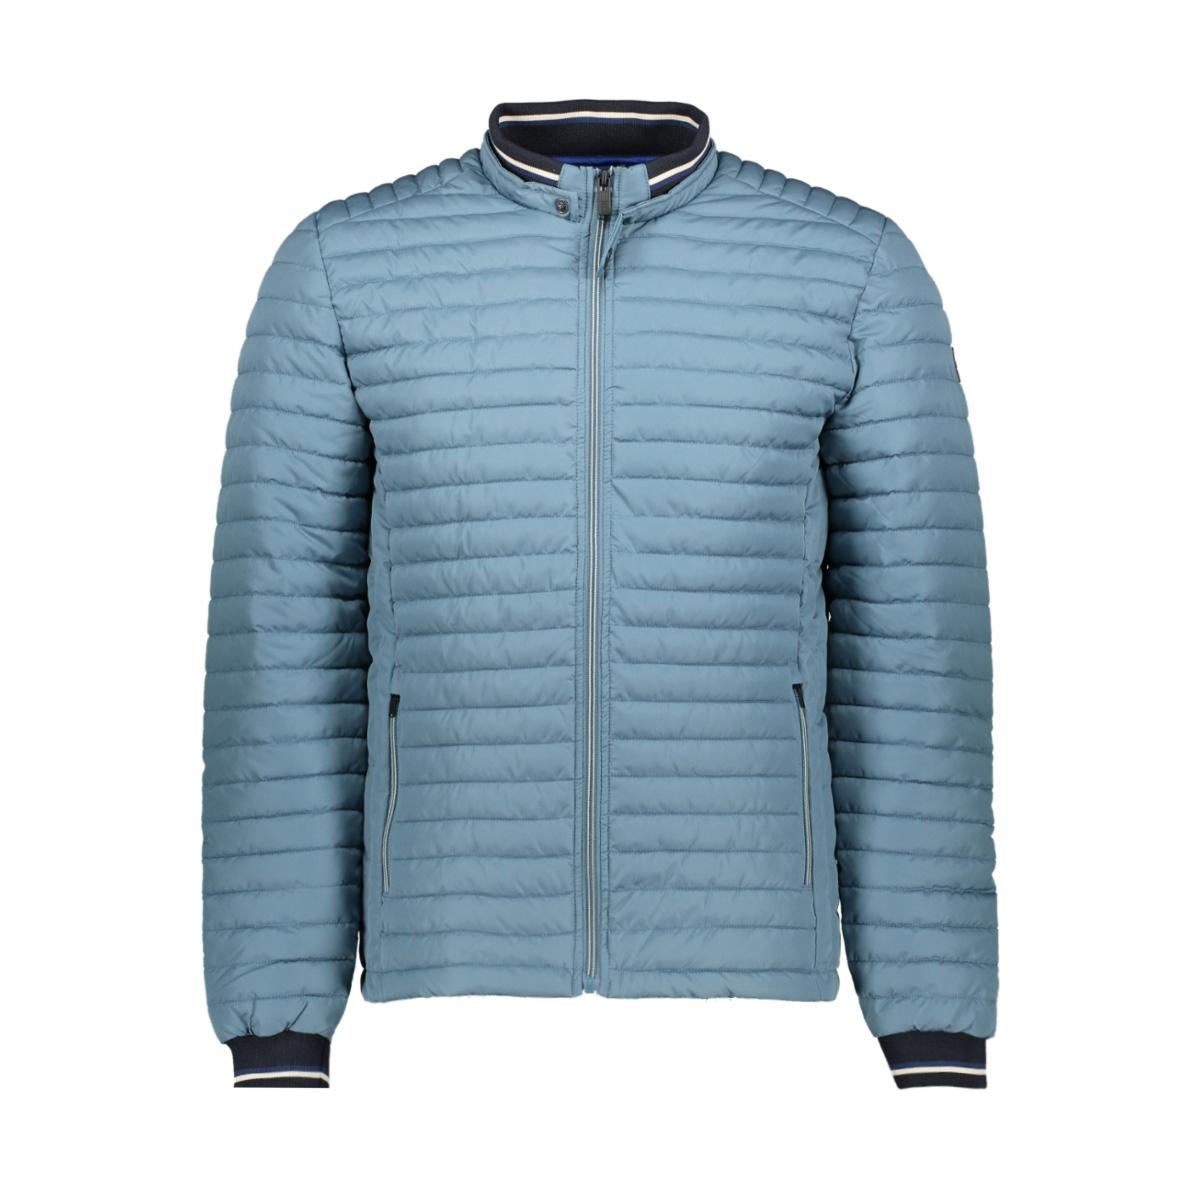 jacket 95630102 no-excess jas 123 steel